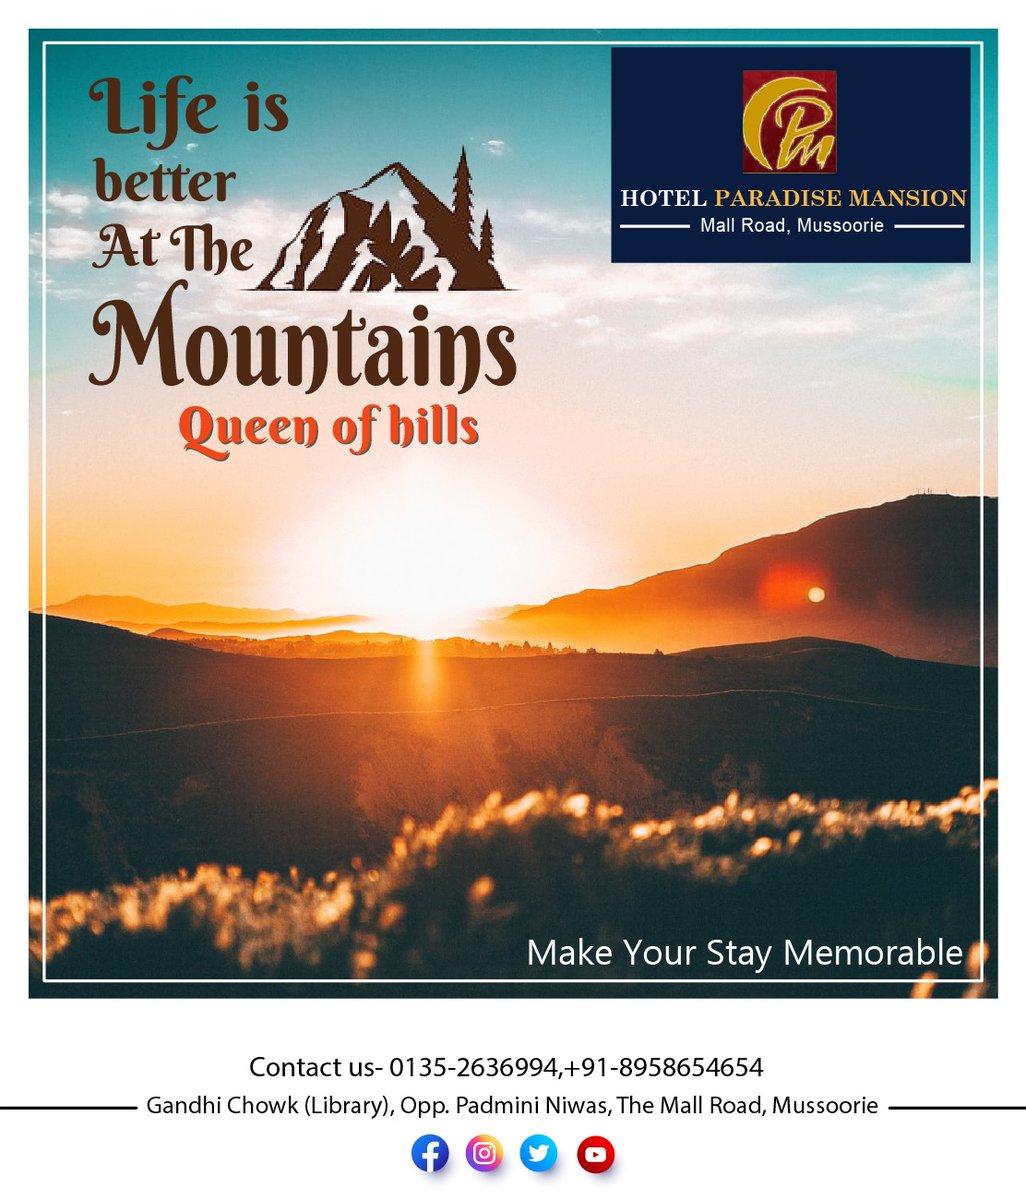 https://t.co/ch177CVWcx  #besthotelsinmussoorieforcouples #4starhotelsinmussooriemallroad #4starhotelsinmussoorieonmallroad #bestbudgethotelsinmussoorie #Mussoorie #queenofhills #uttarakhand #dehradun #mountains #himalayas #travel #india #travelgram #nature #incredibleindia https://t.co/Yh3HzoFz2t